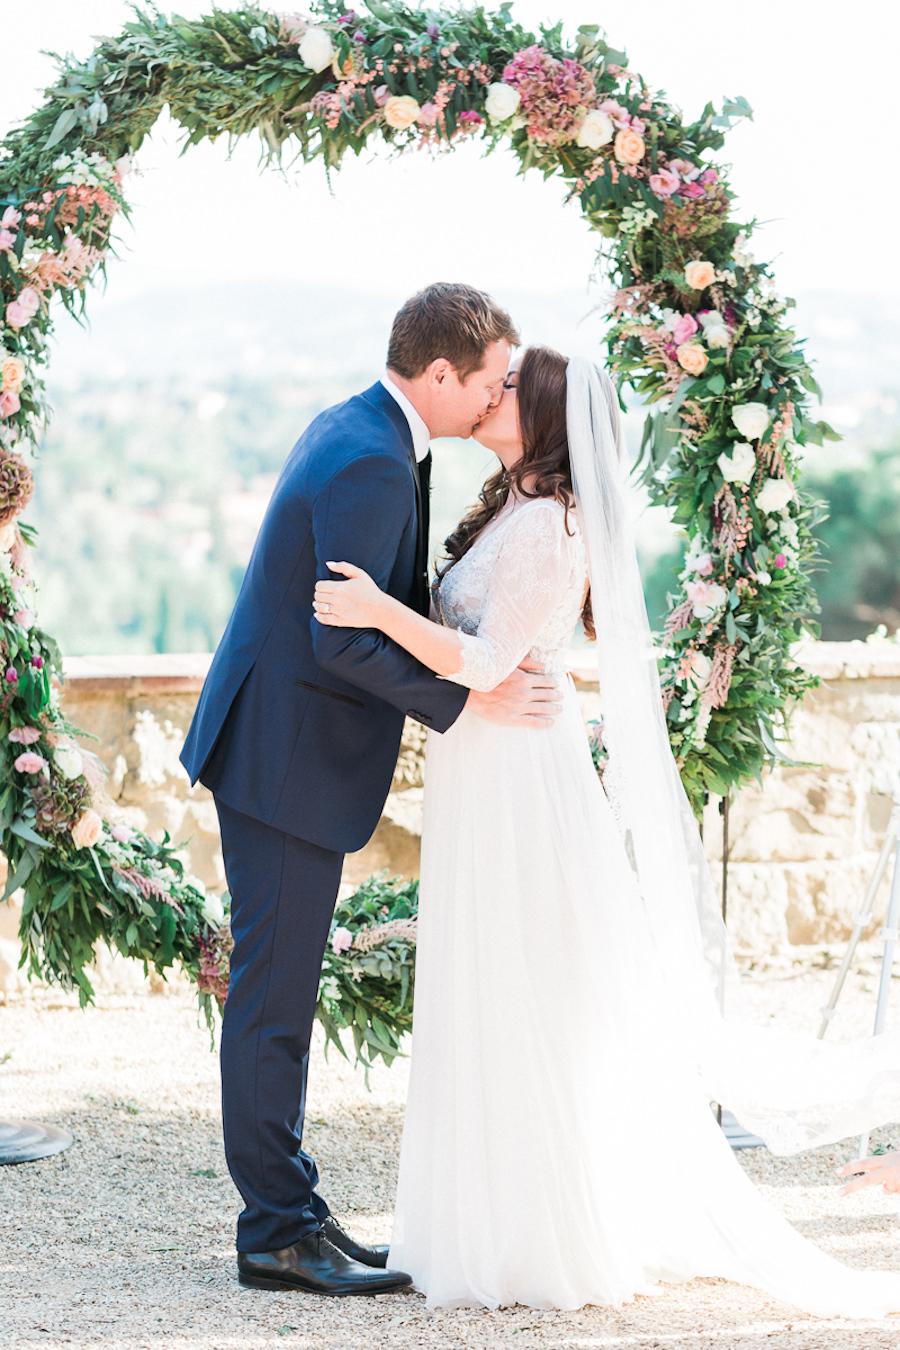 ceremony kiss - photo by Kylee Yee http://ruffledblog.com/romantic-al-fresco-wedding-in-tuscany